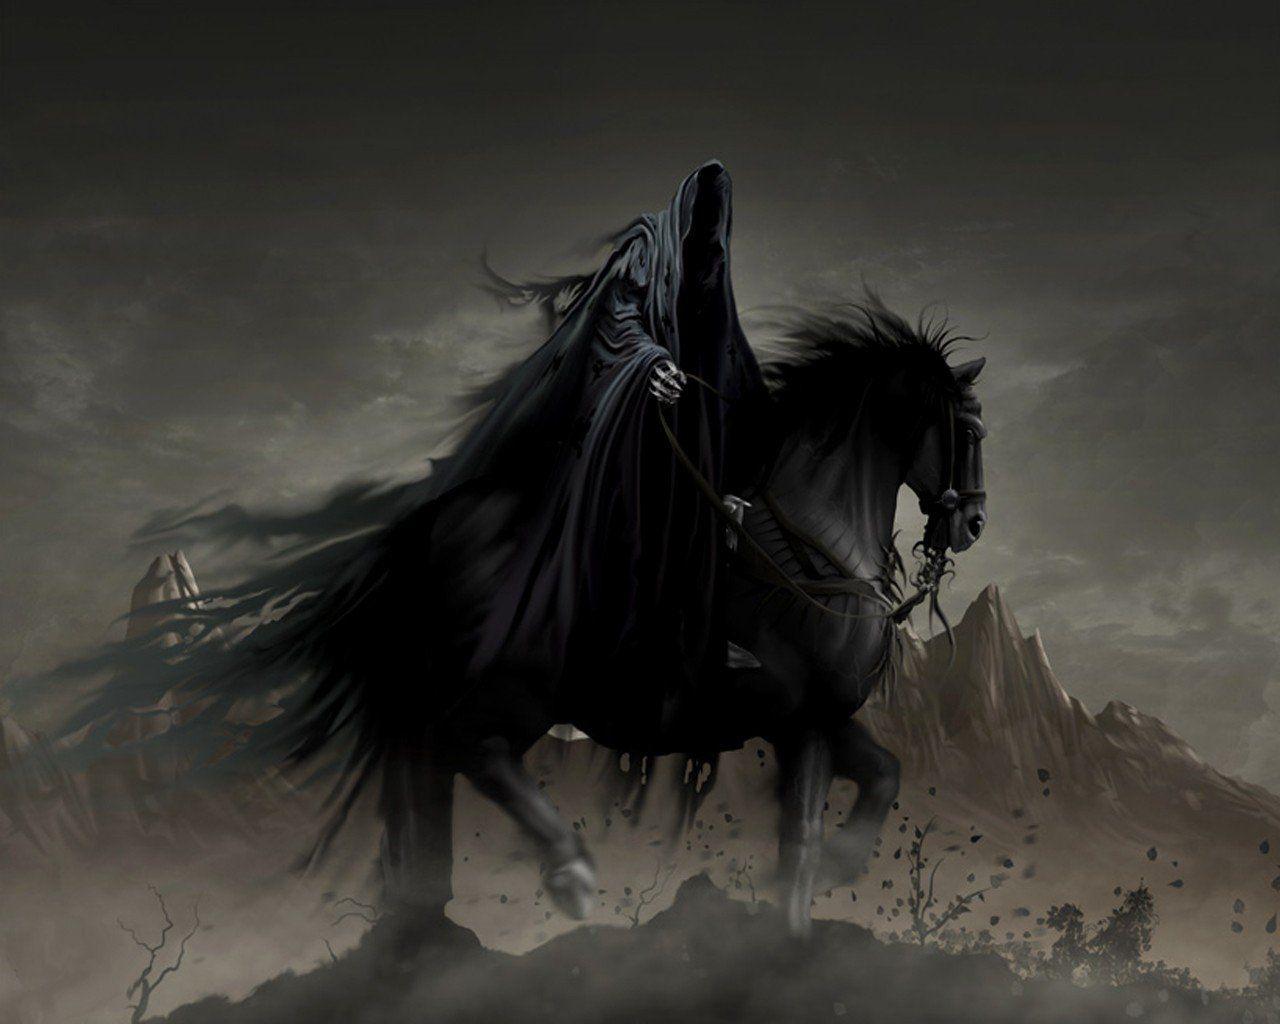 Beautiful Wallpaper Horse Ghost Rider - 0afce6a73294048fe6ff12fa7d8ae2a3  Pic_672210.jpg